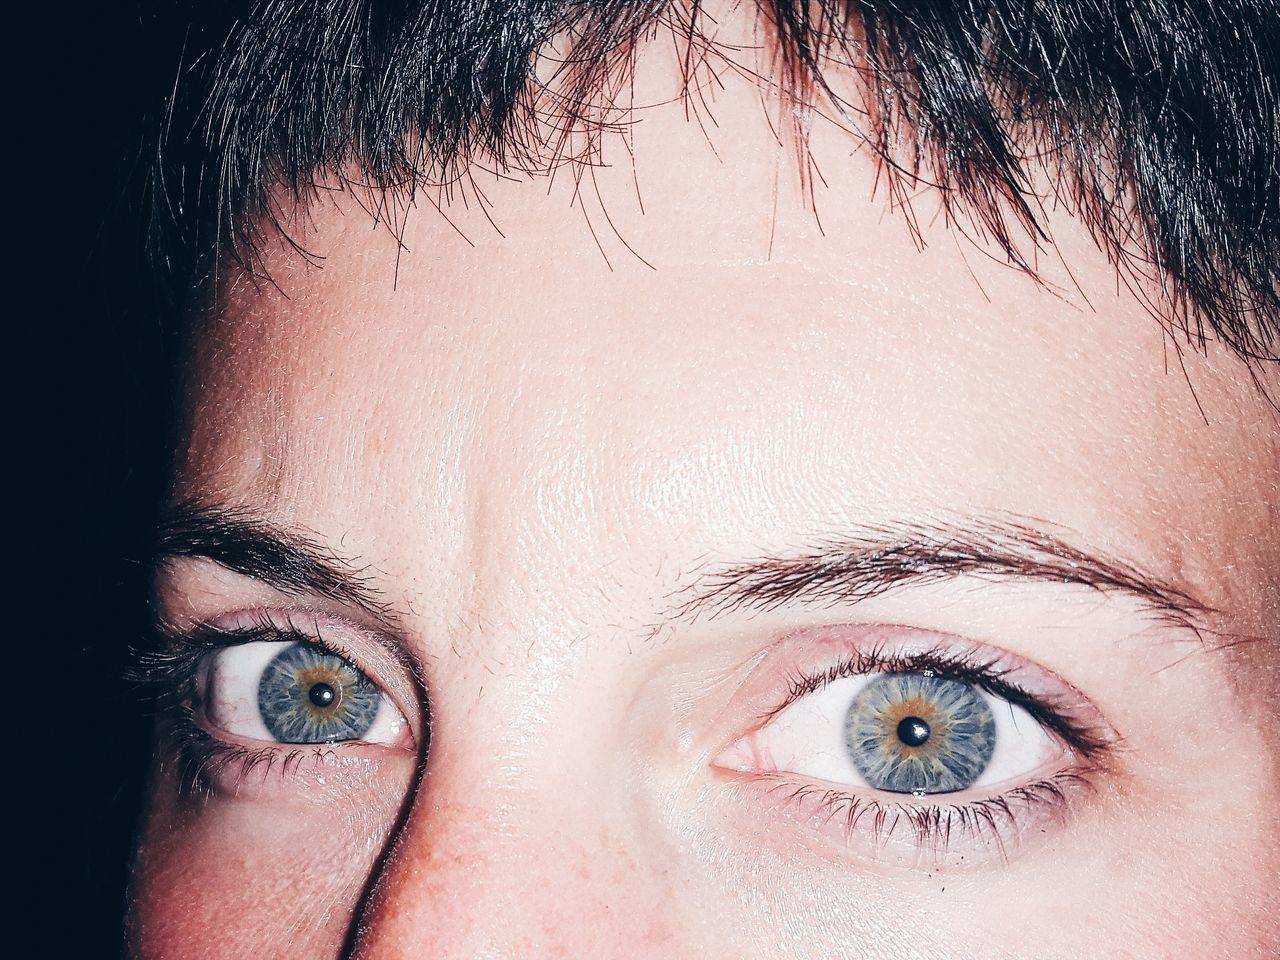 human eye, looking at camera, human body part, real people, portrait, one person, close-up, eyelash, eyebrow, human skin, eyesight, sensory perception, human face, eyeball, beautiful woman, indoors, day, adult, people